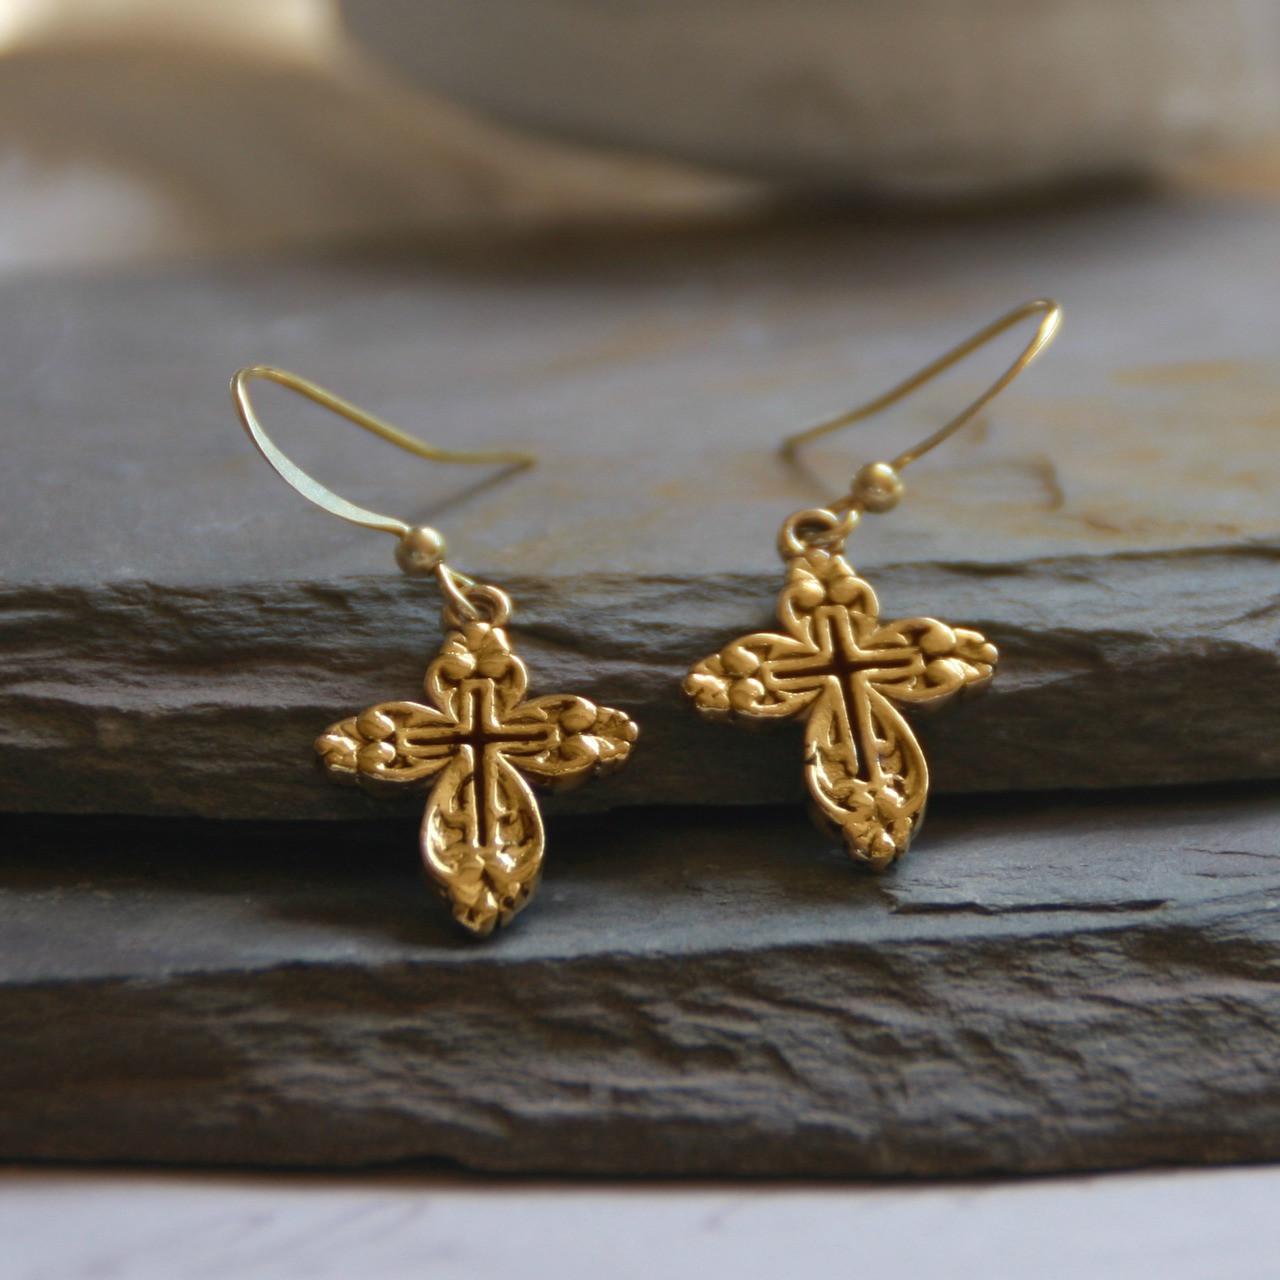 IN-1  Openwork Classic Cross Earrings Gold Finish